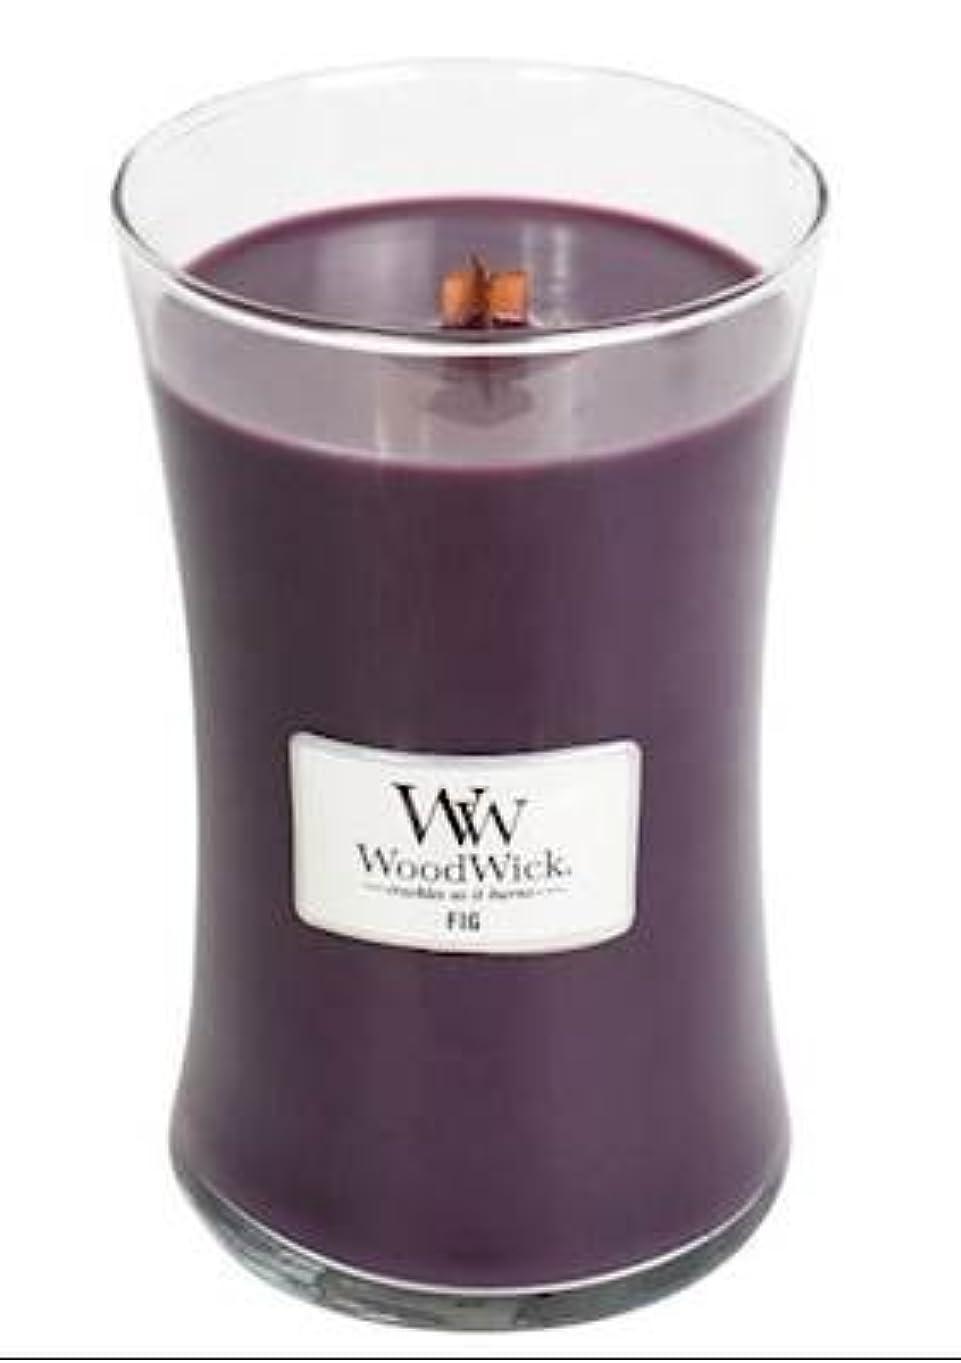 Fig – WoodWick 22oz Medium Jar Candle Burns 180時間